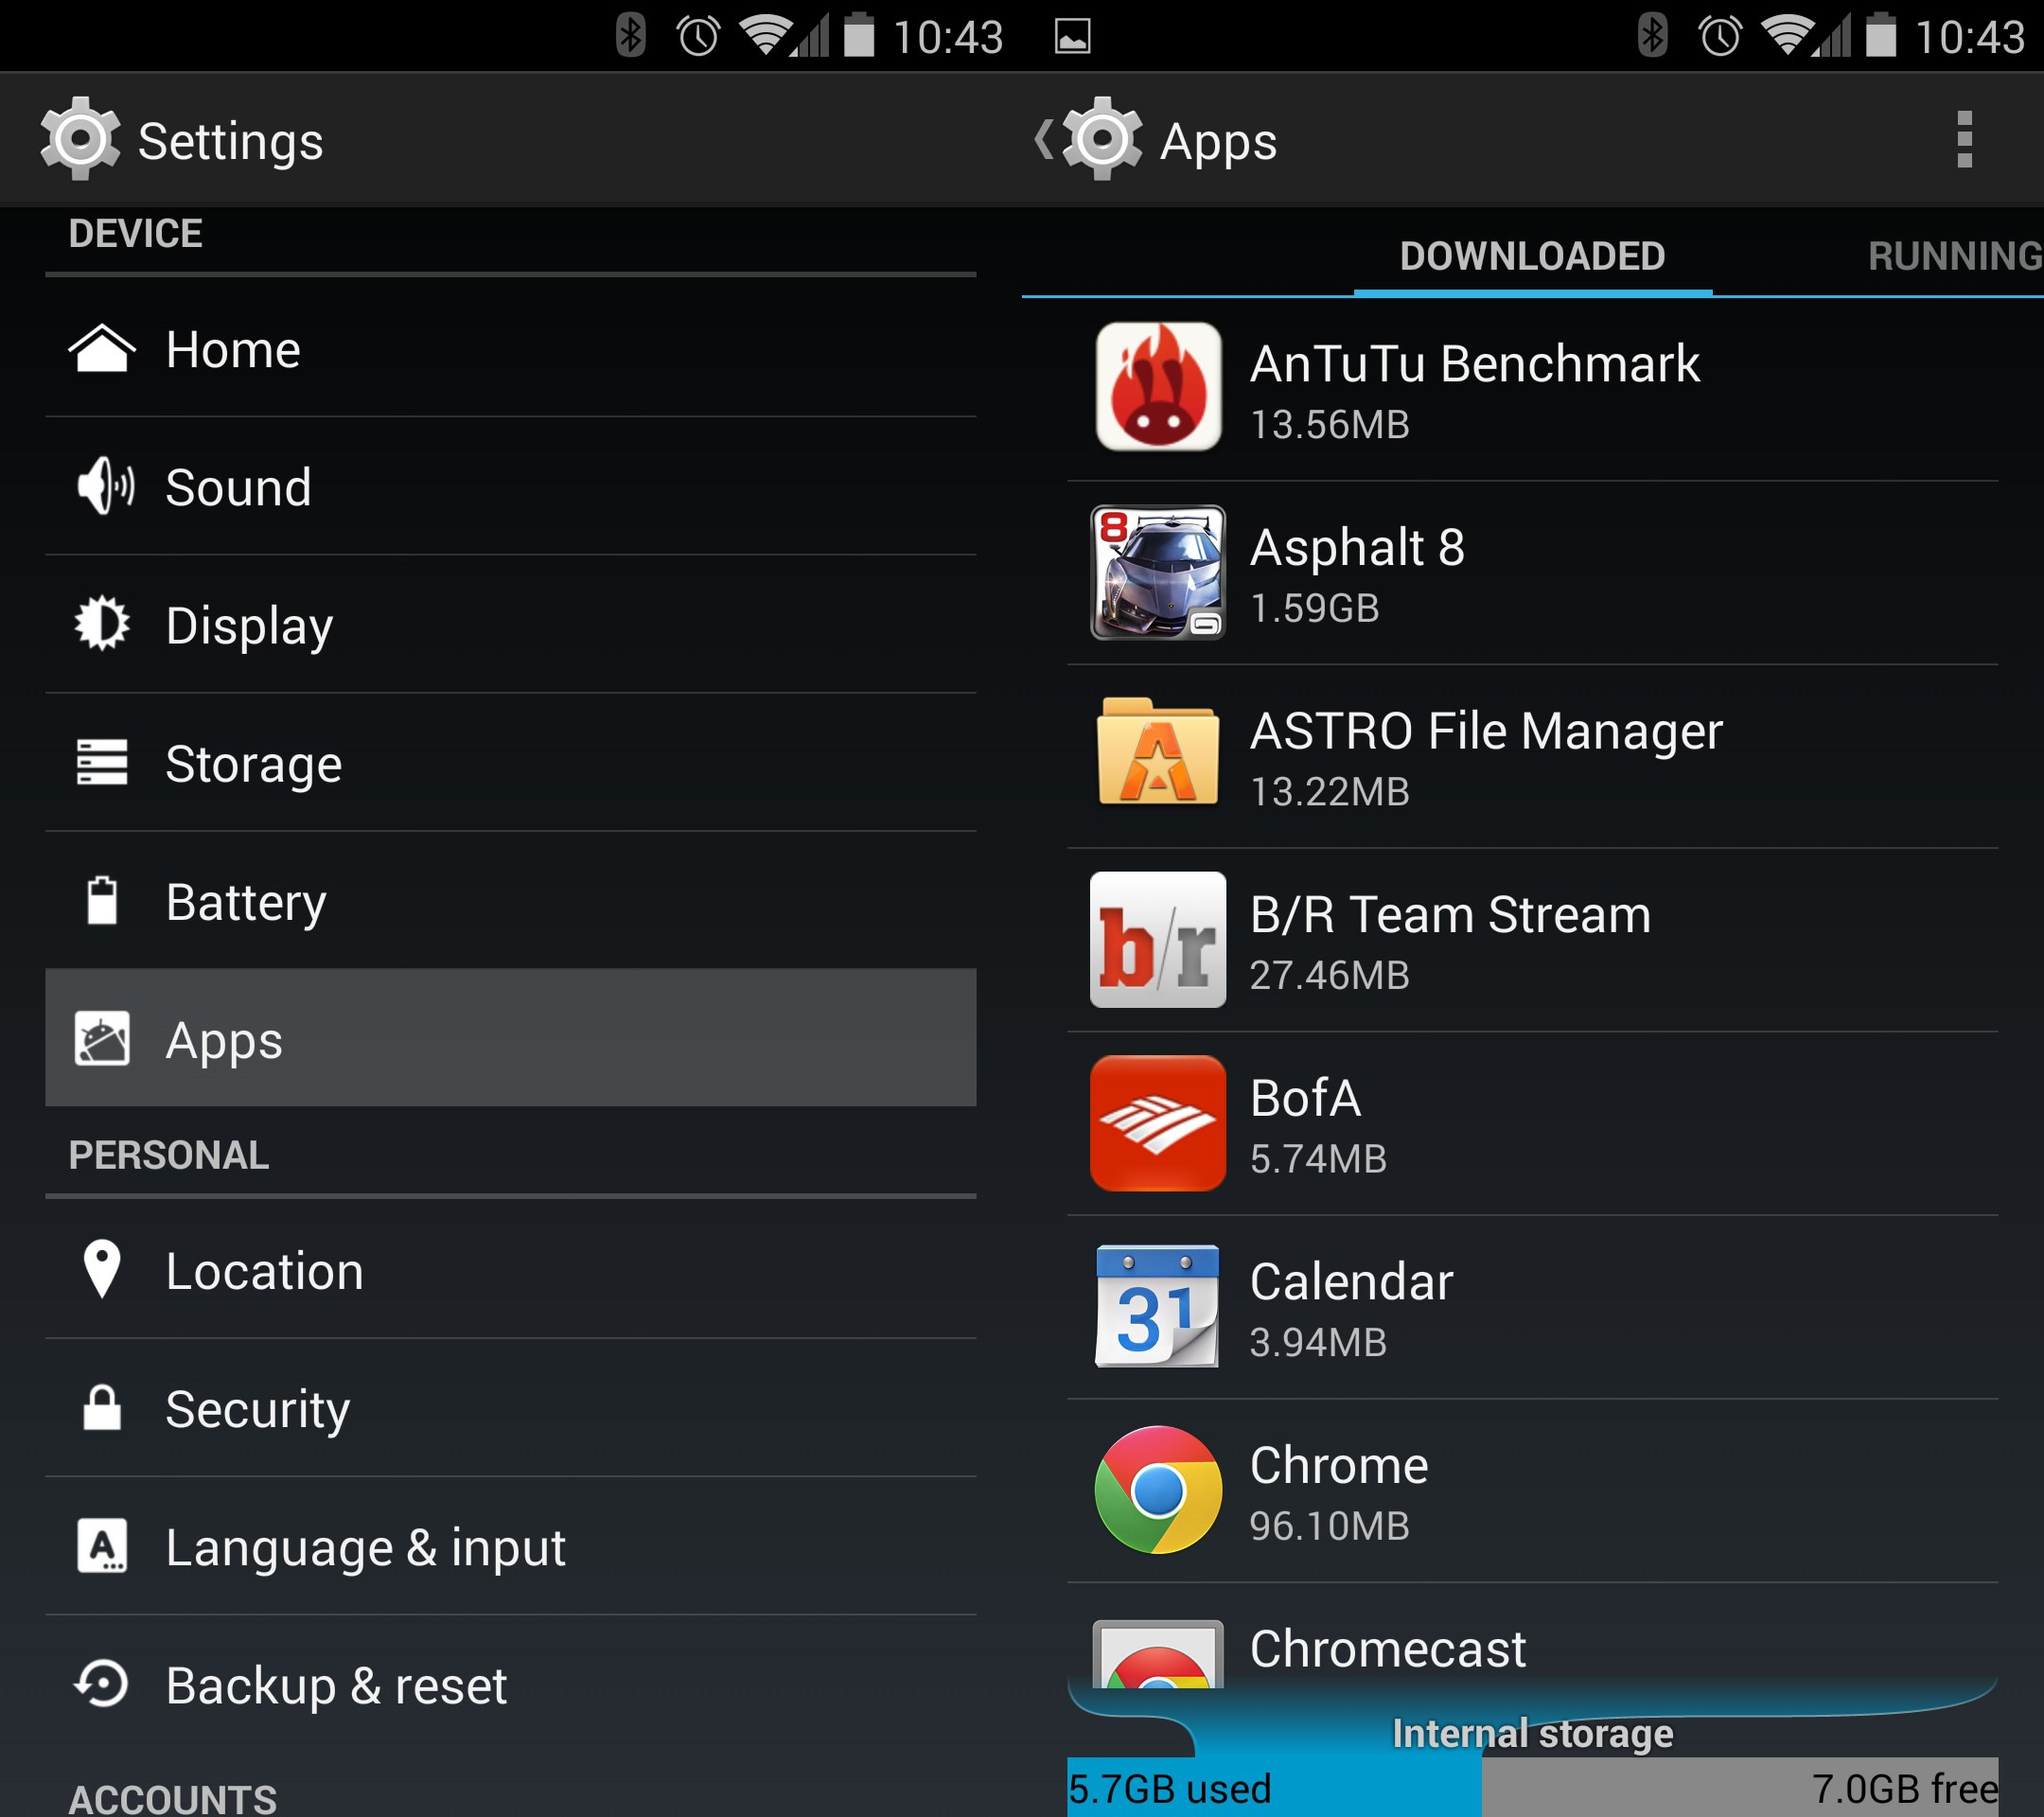 apps-downloaded.jpg